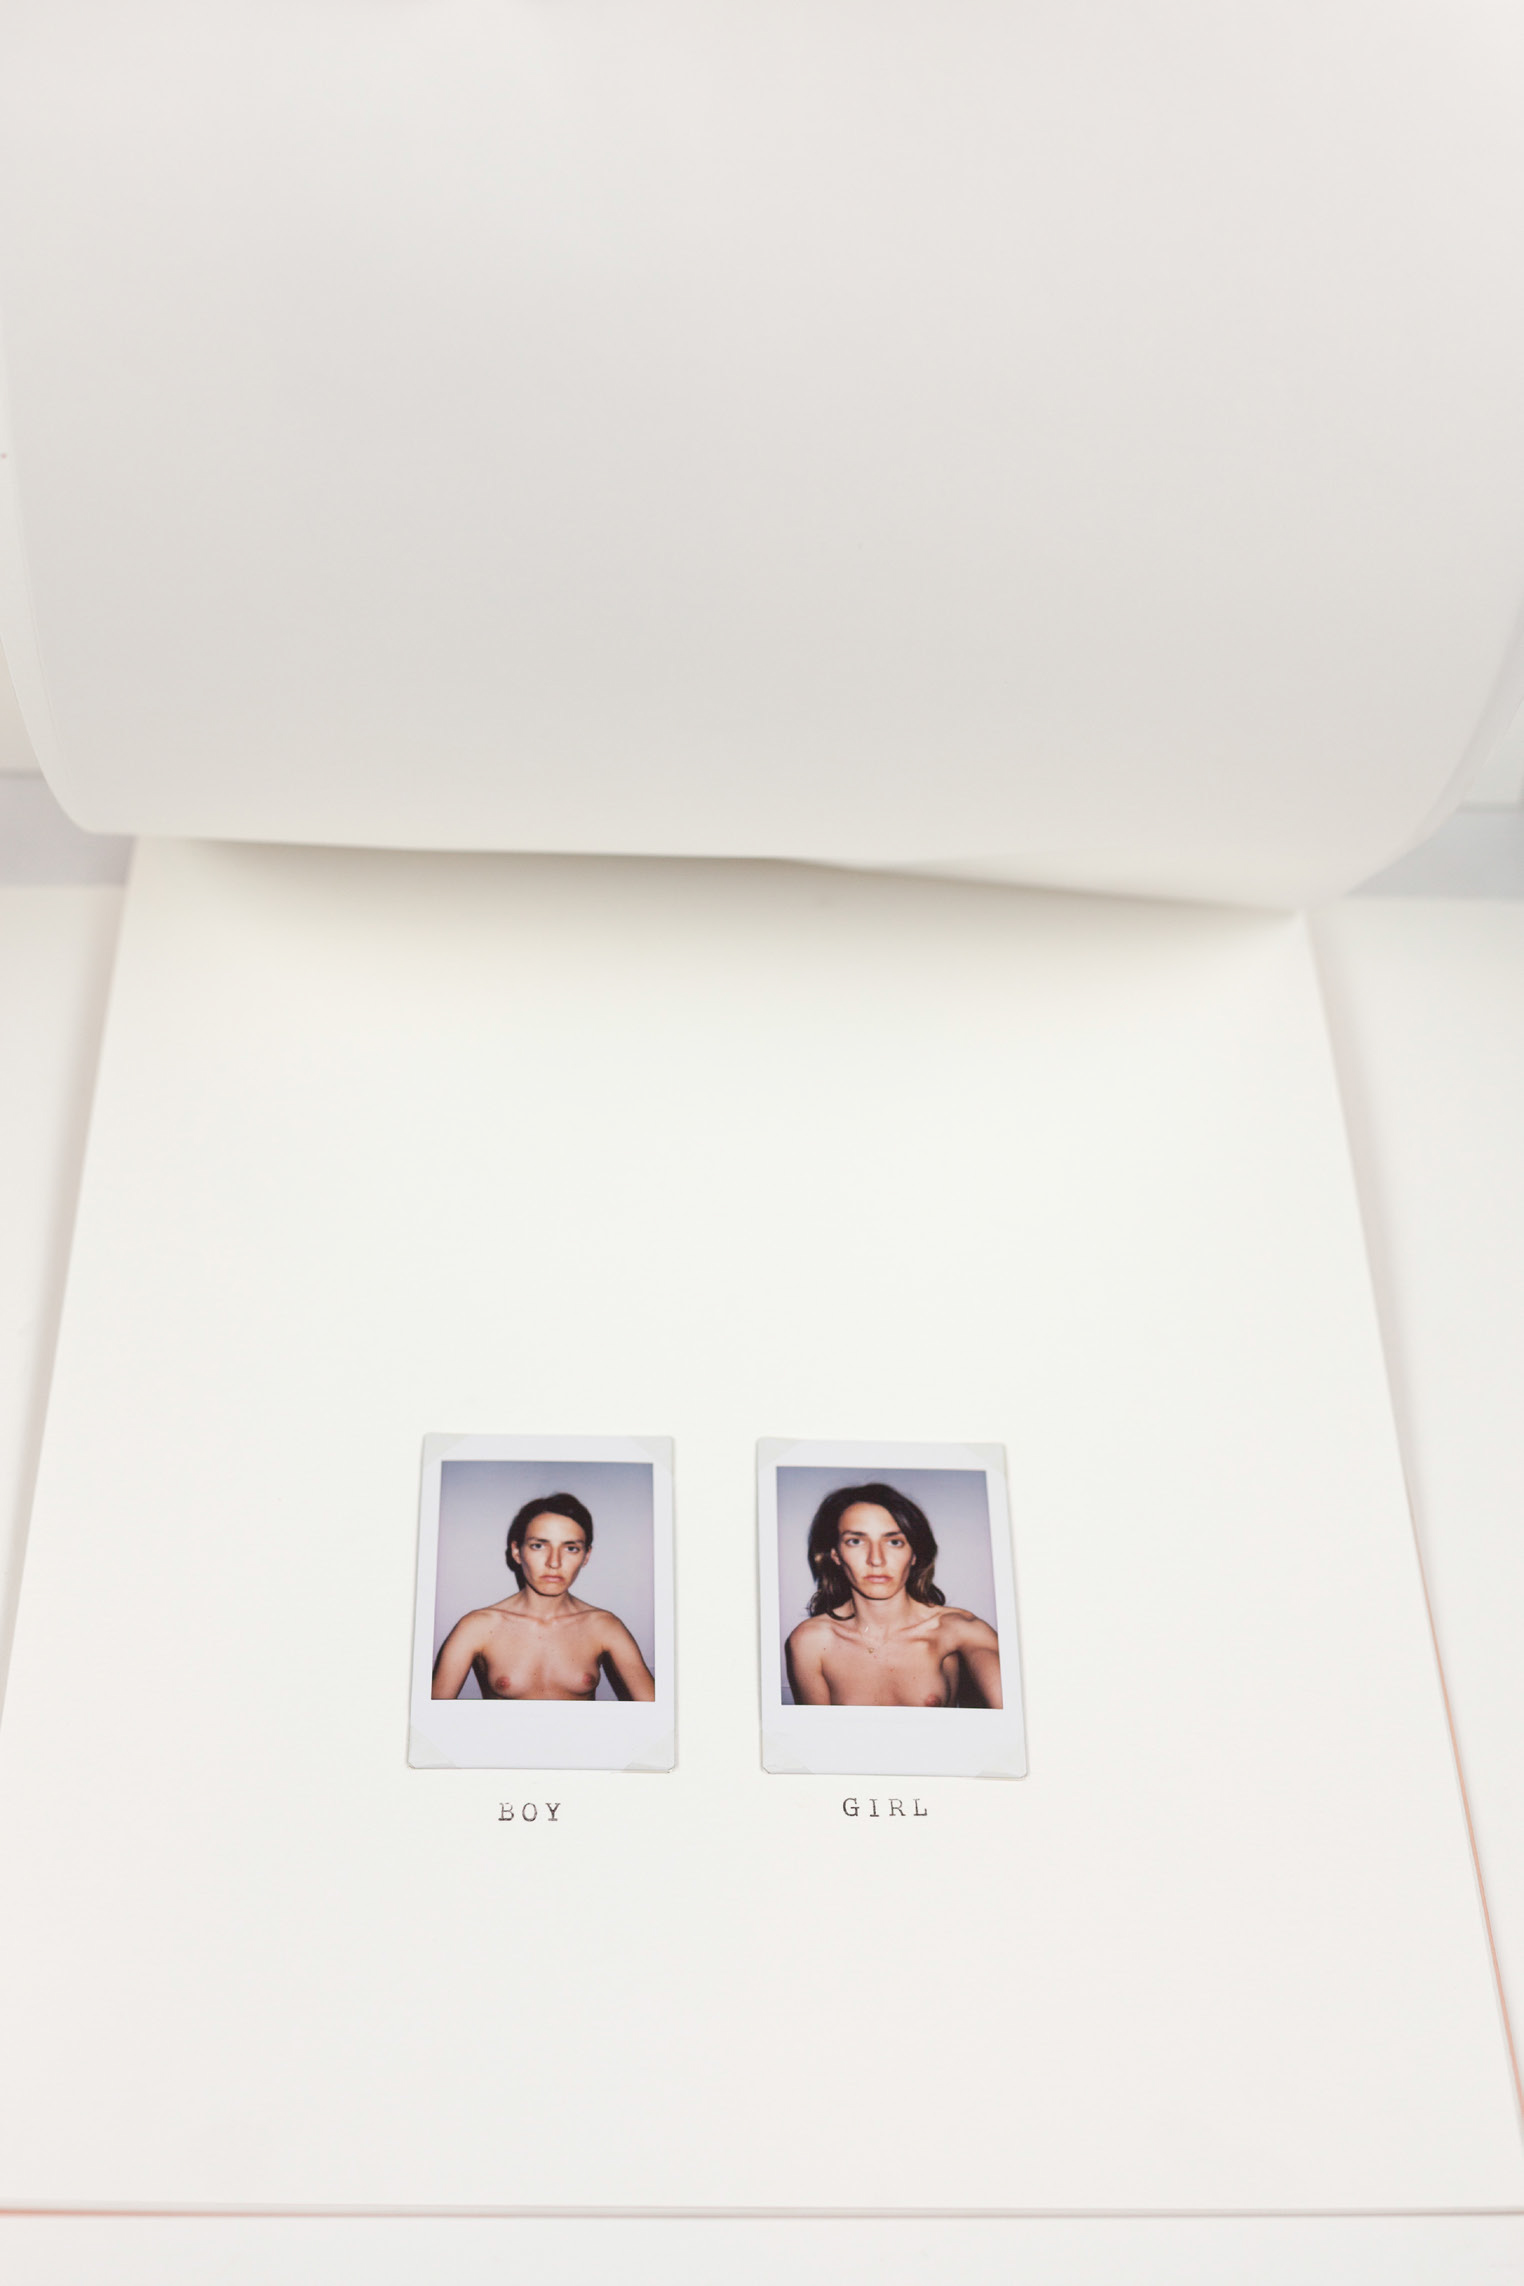 Carolina-Pimenta-One-Shot-Artist-book_023.jpg